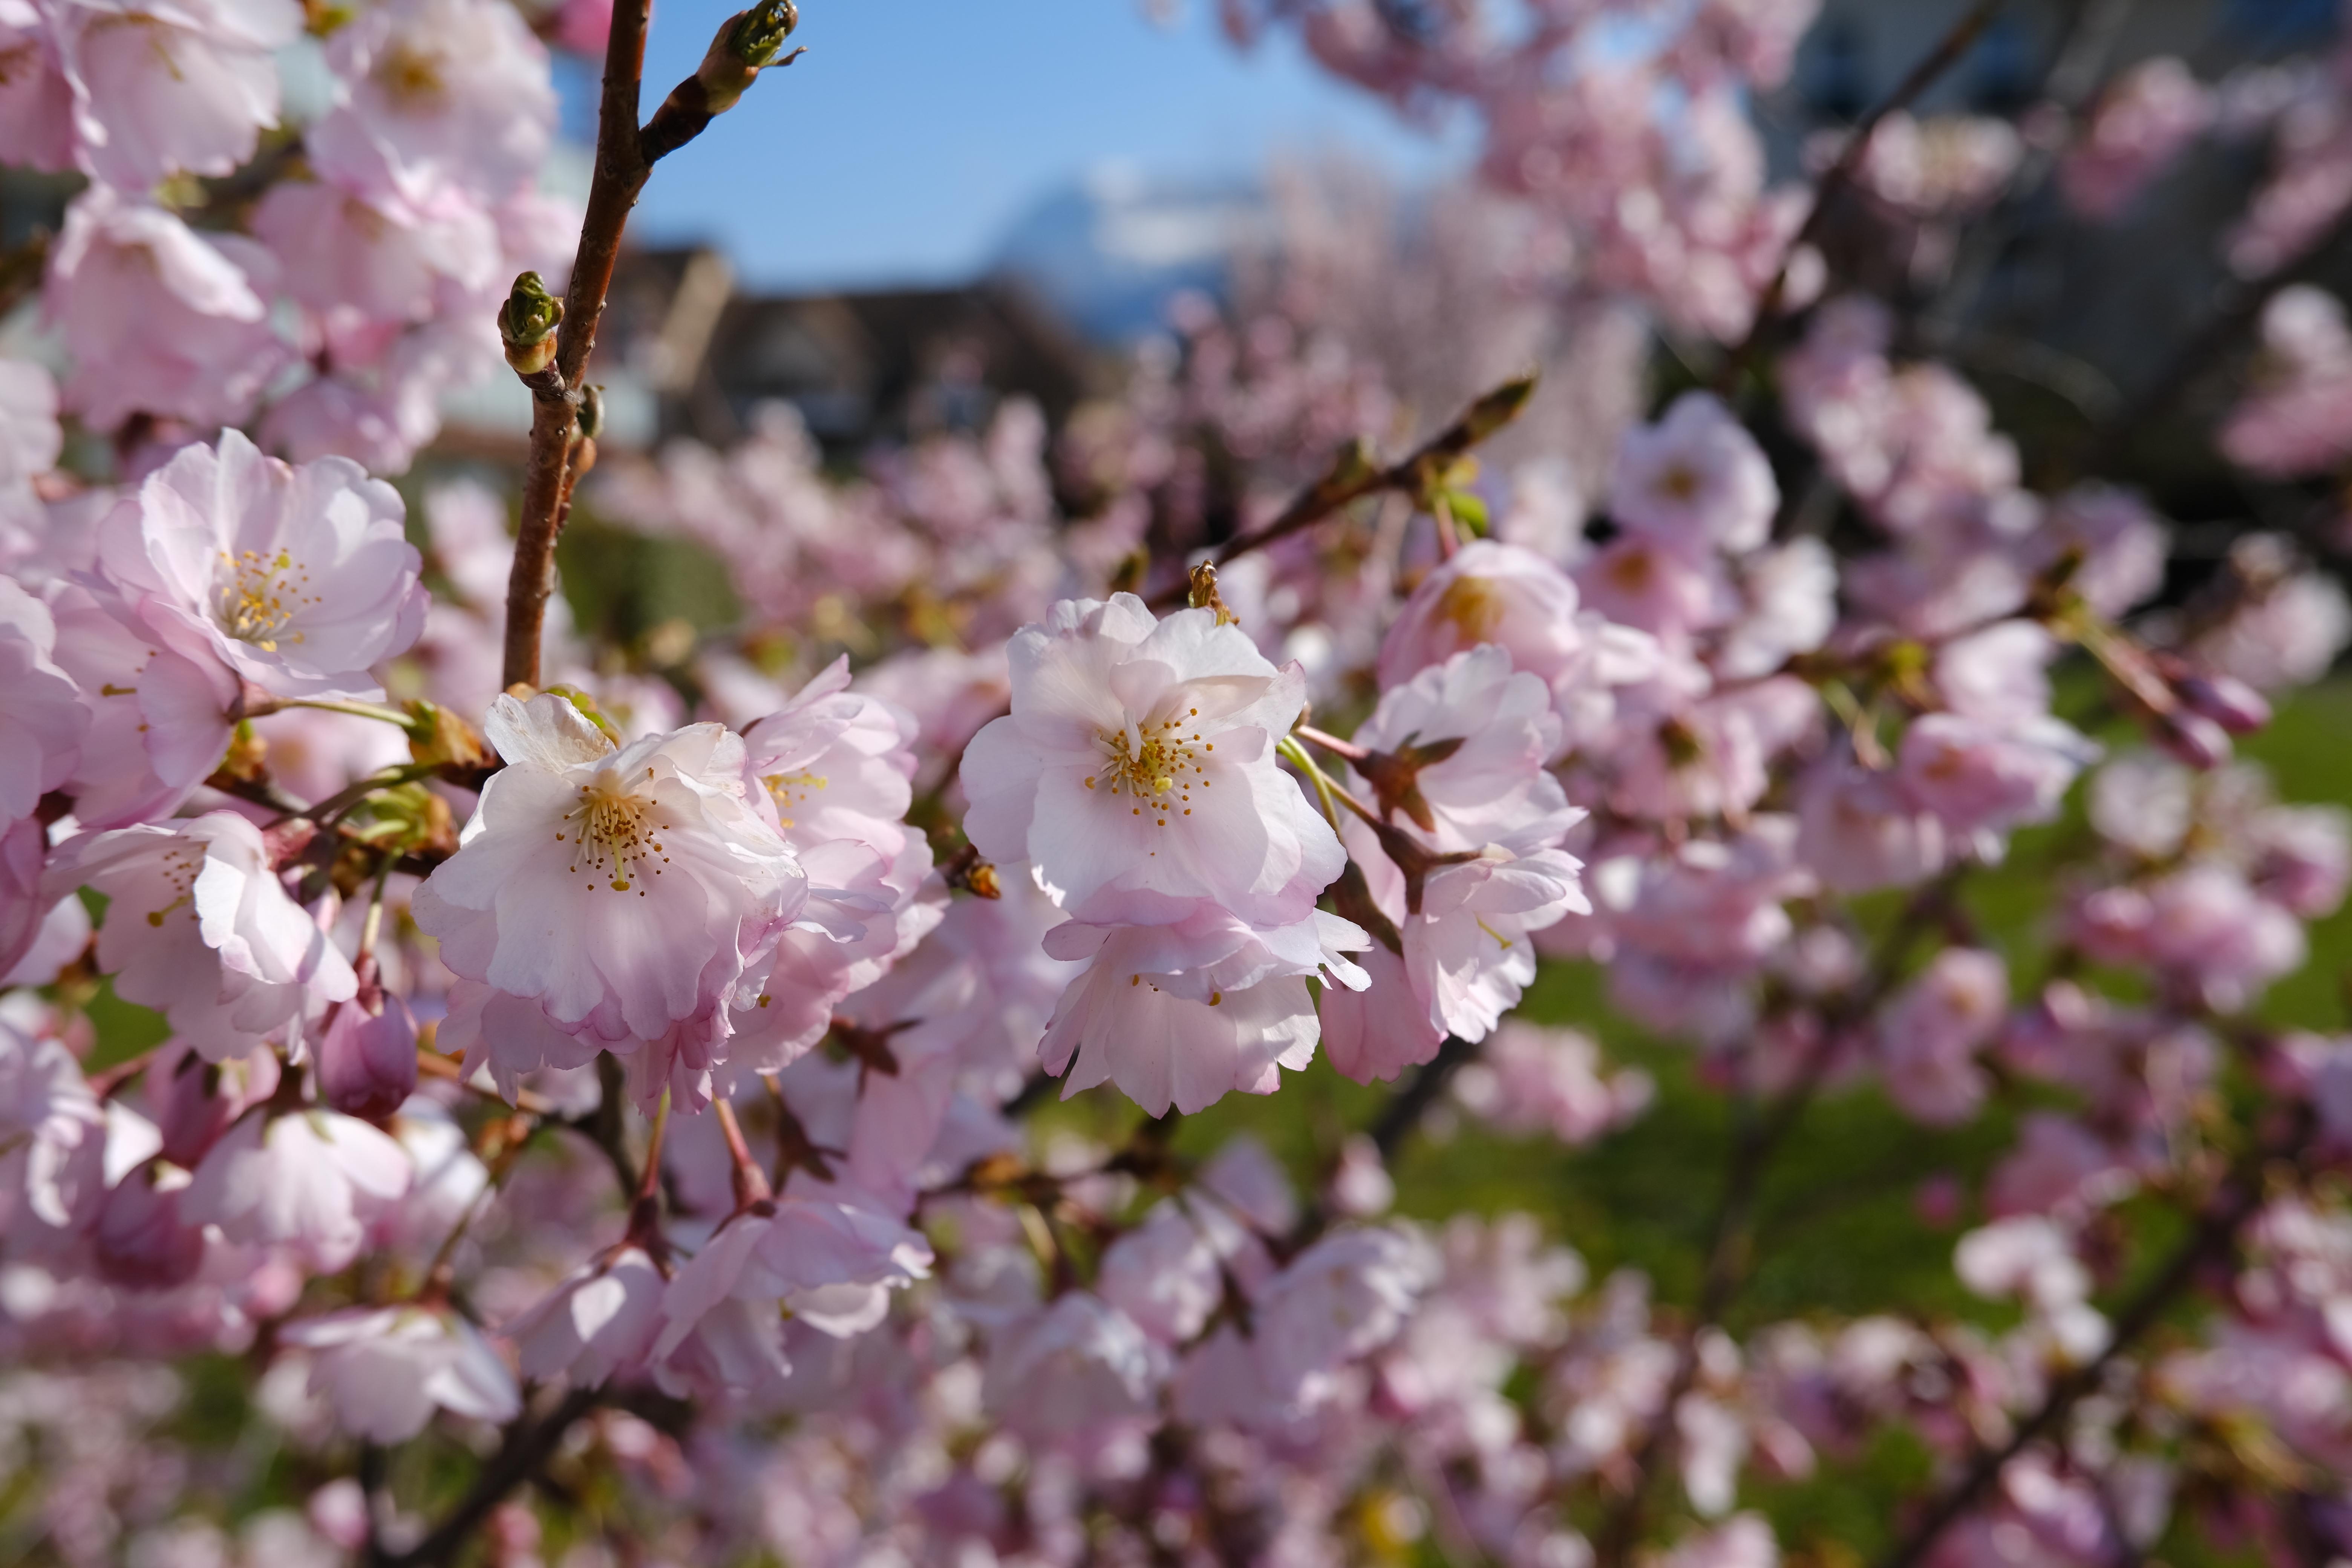 102929 Screensavers and Wallpapers Sakura for phone. Download Flowers, Sakura, Macro, Petals, Branches, Spring pictures for free